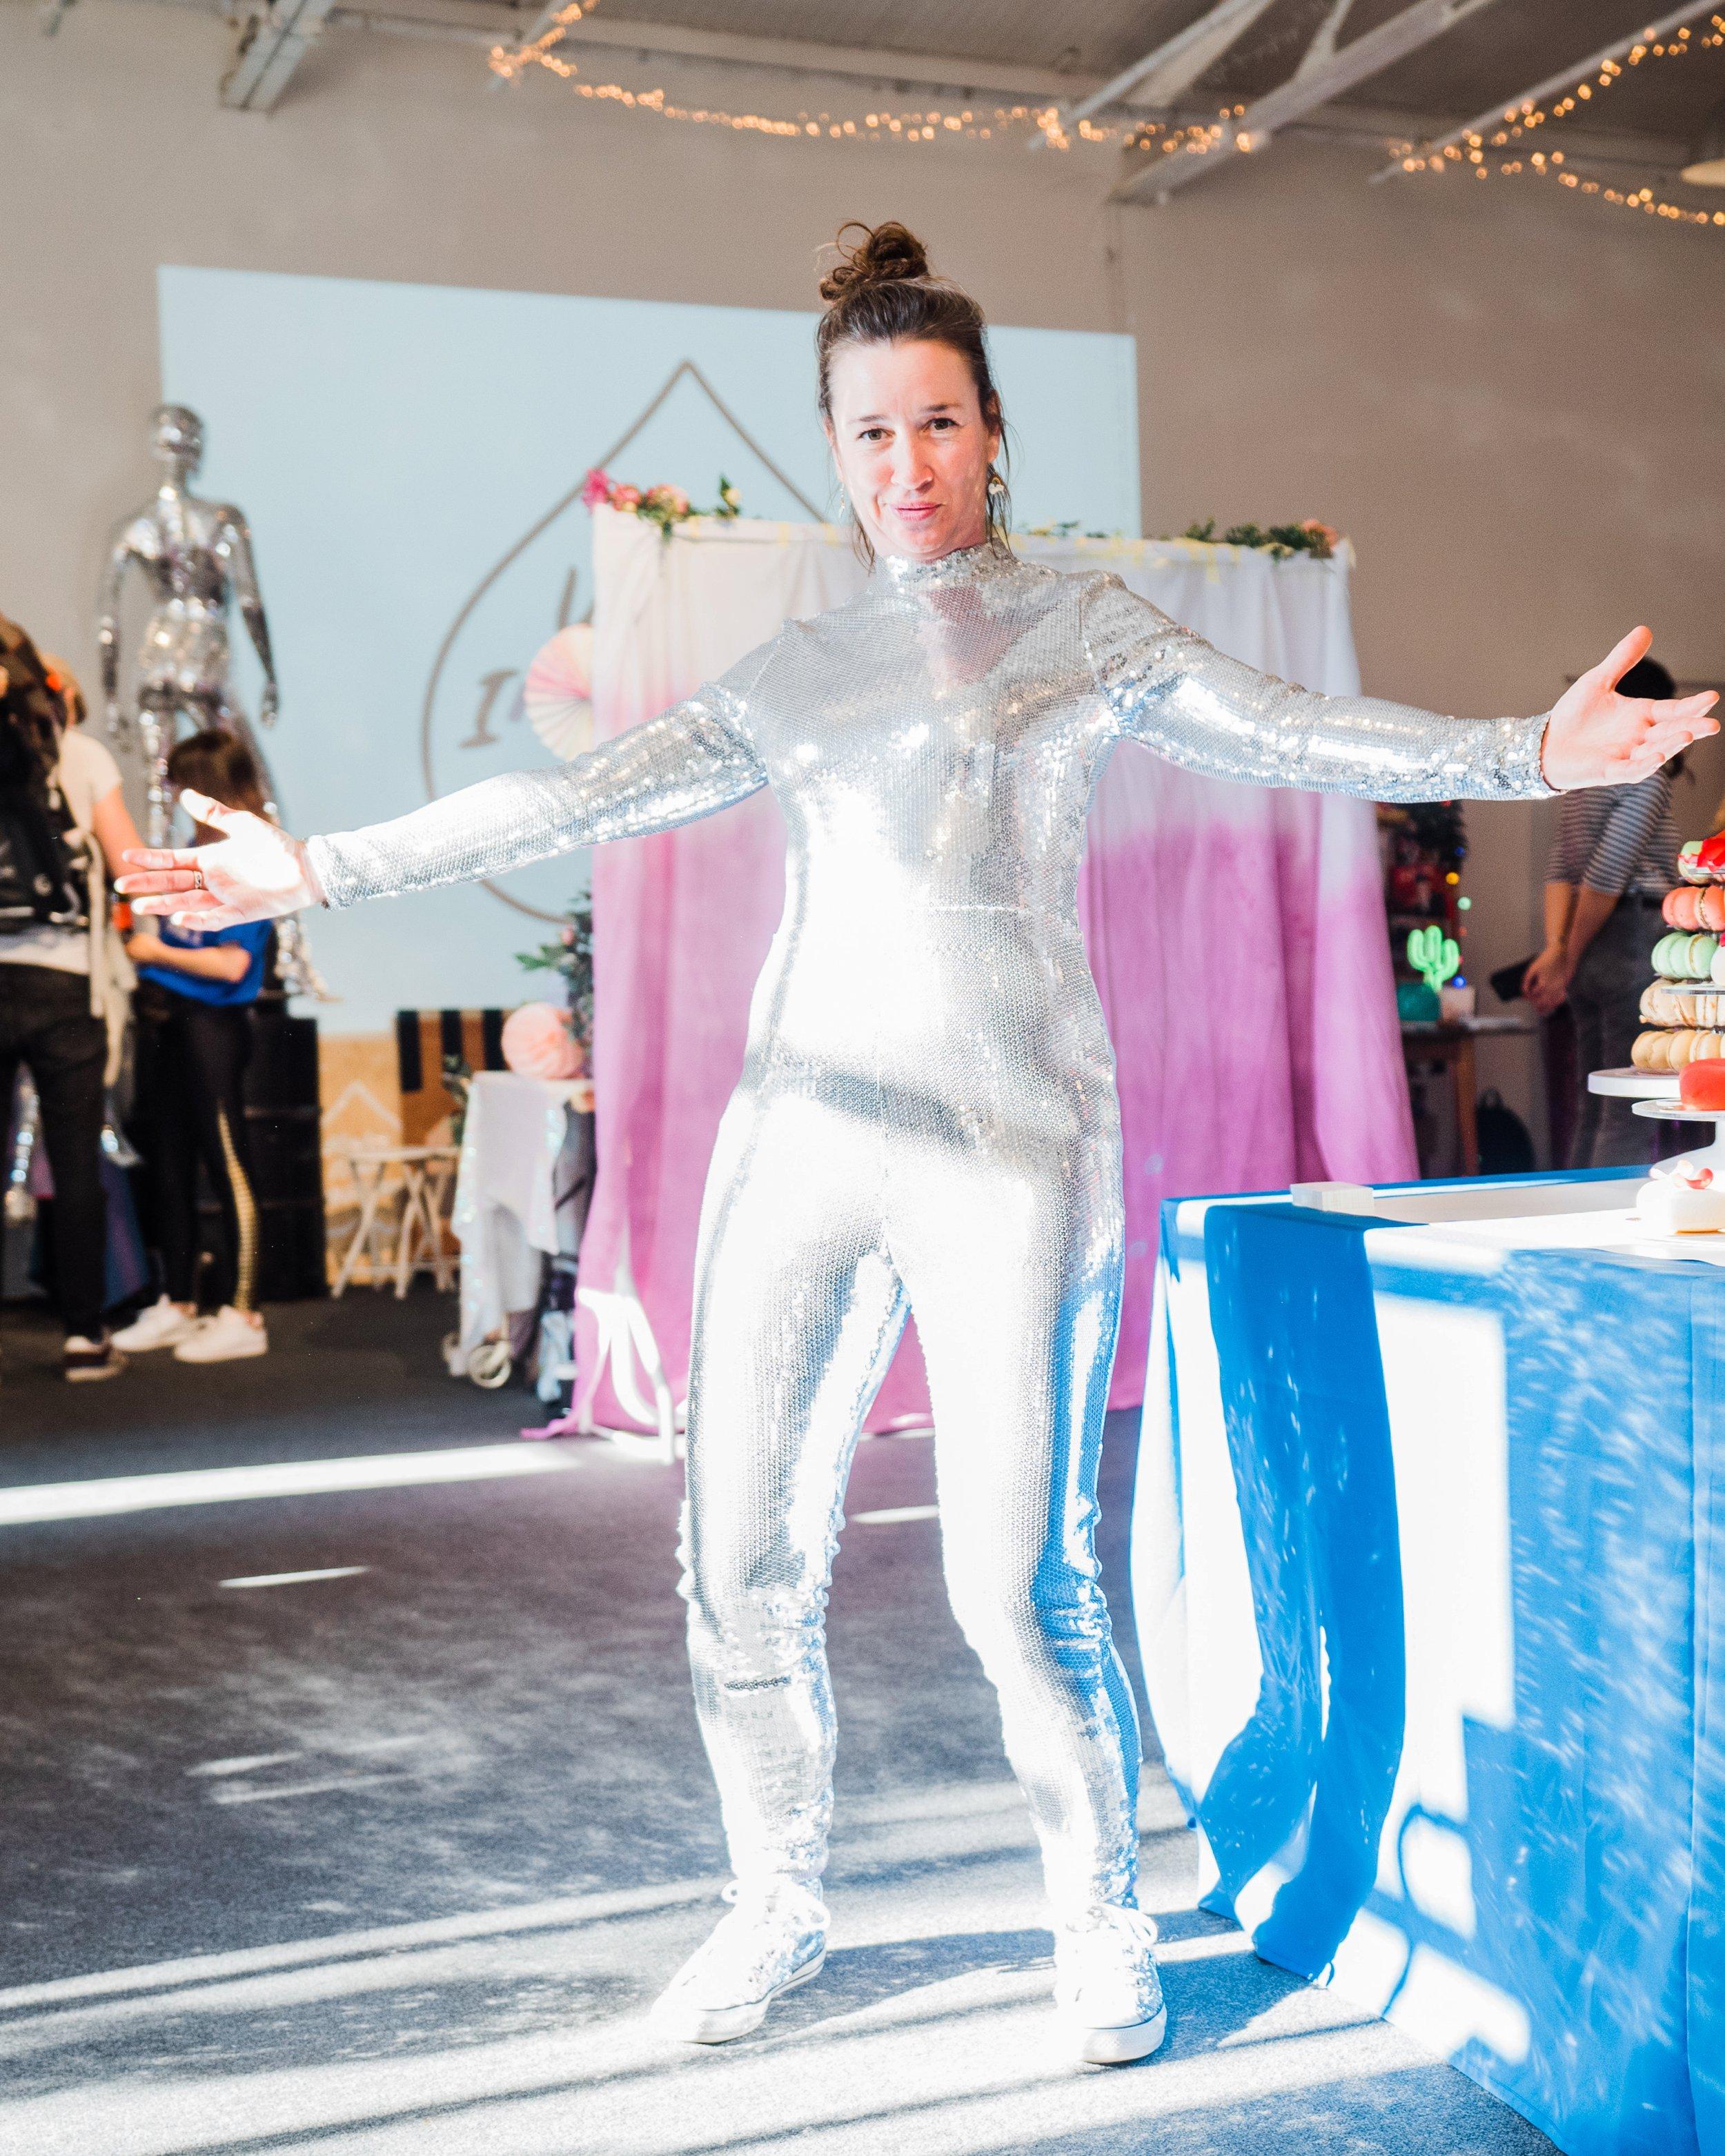 The UN-WEDDING SHOW 2019 cool bride style modern wedding fair Birmingham Fazeley Studios 00030.jpg